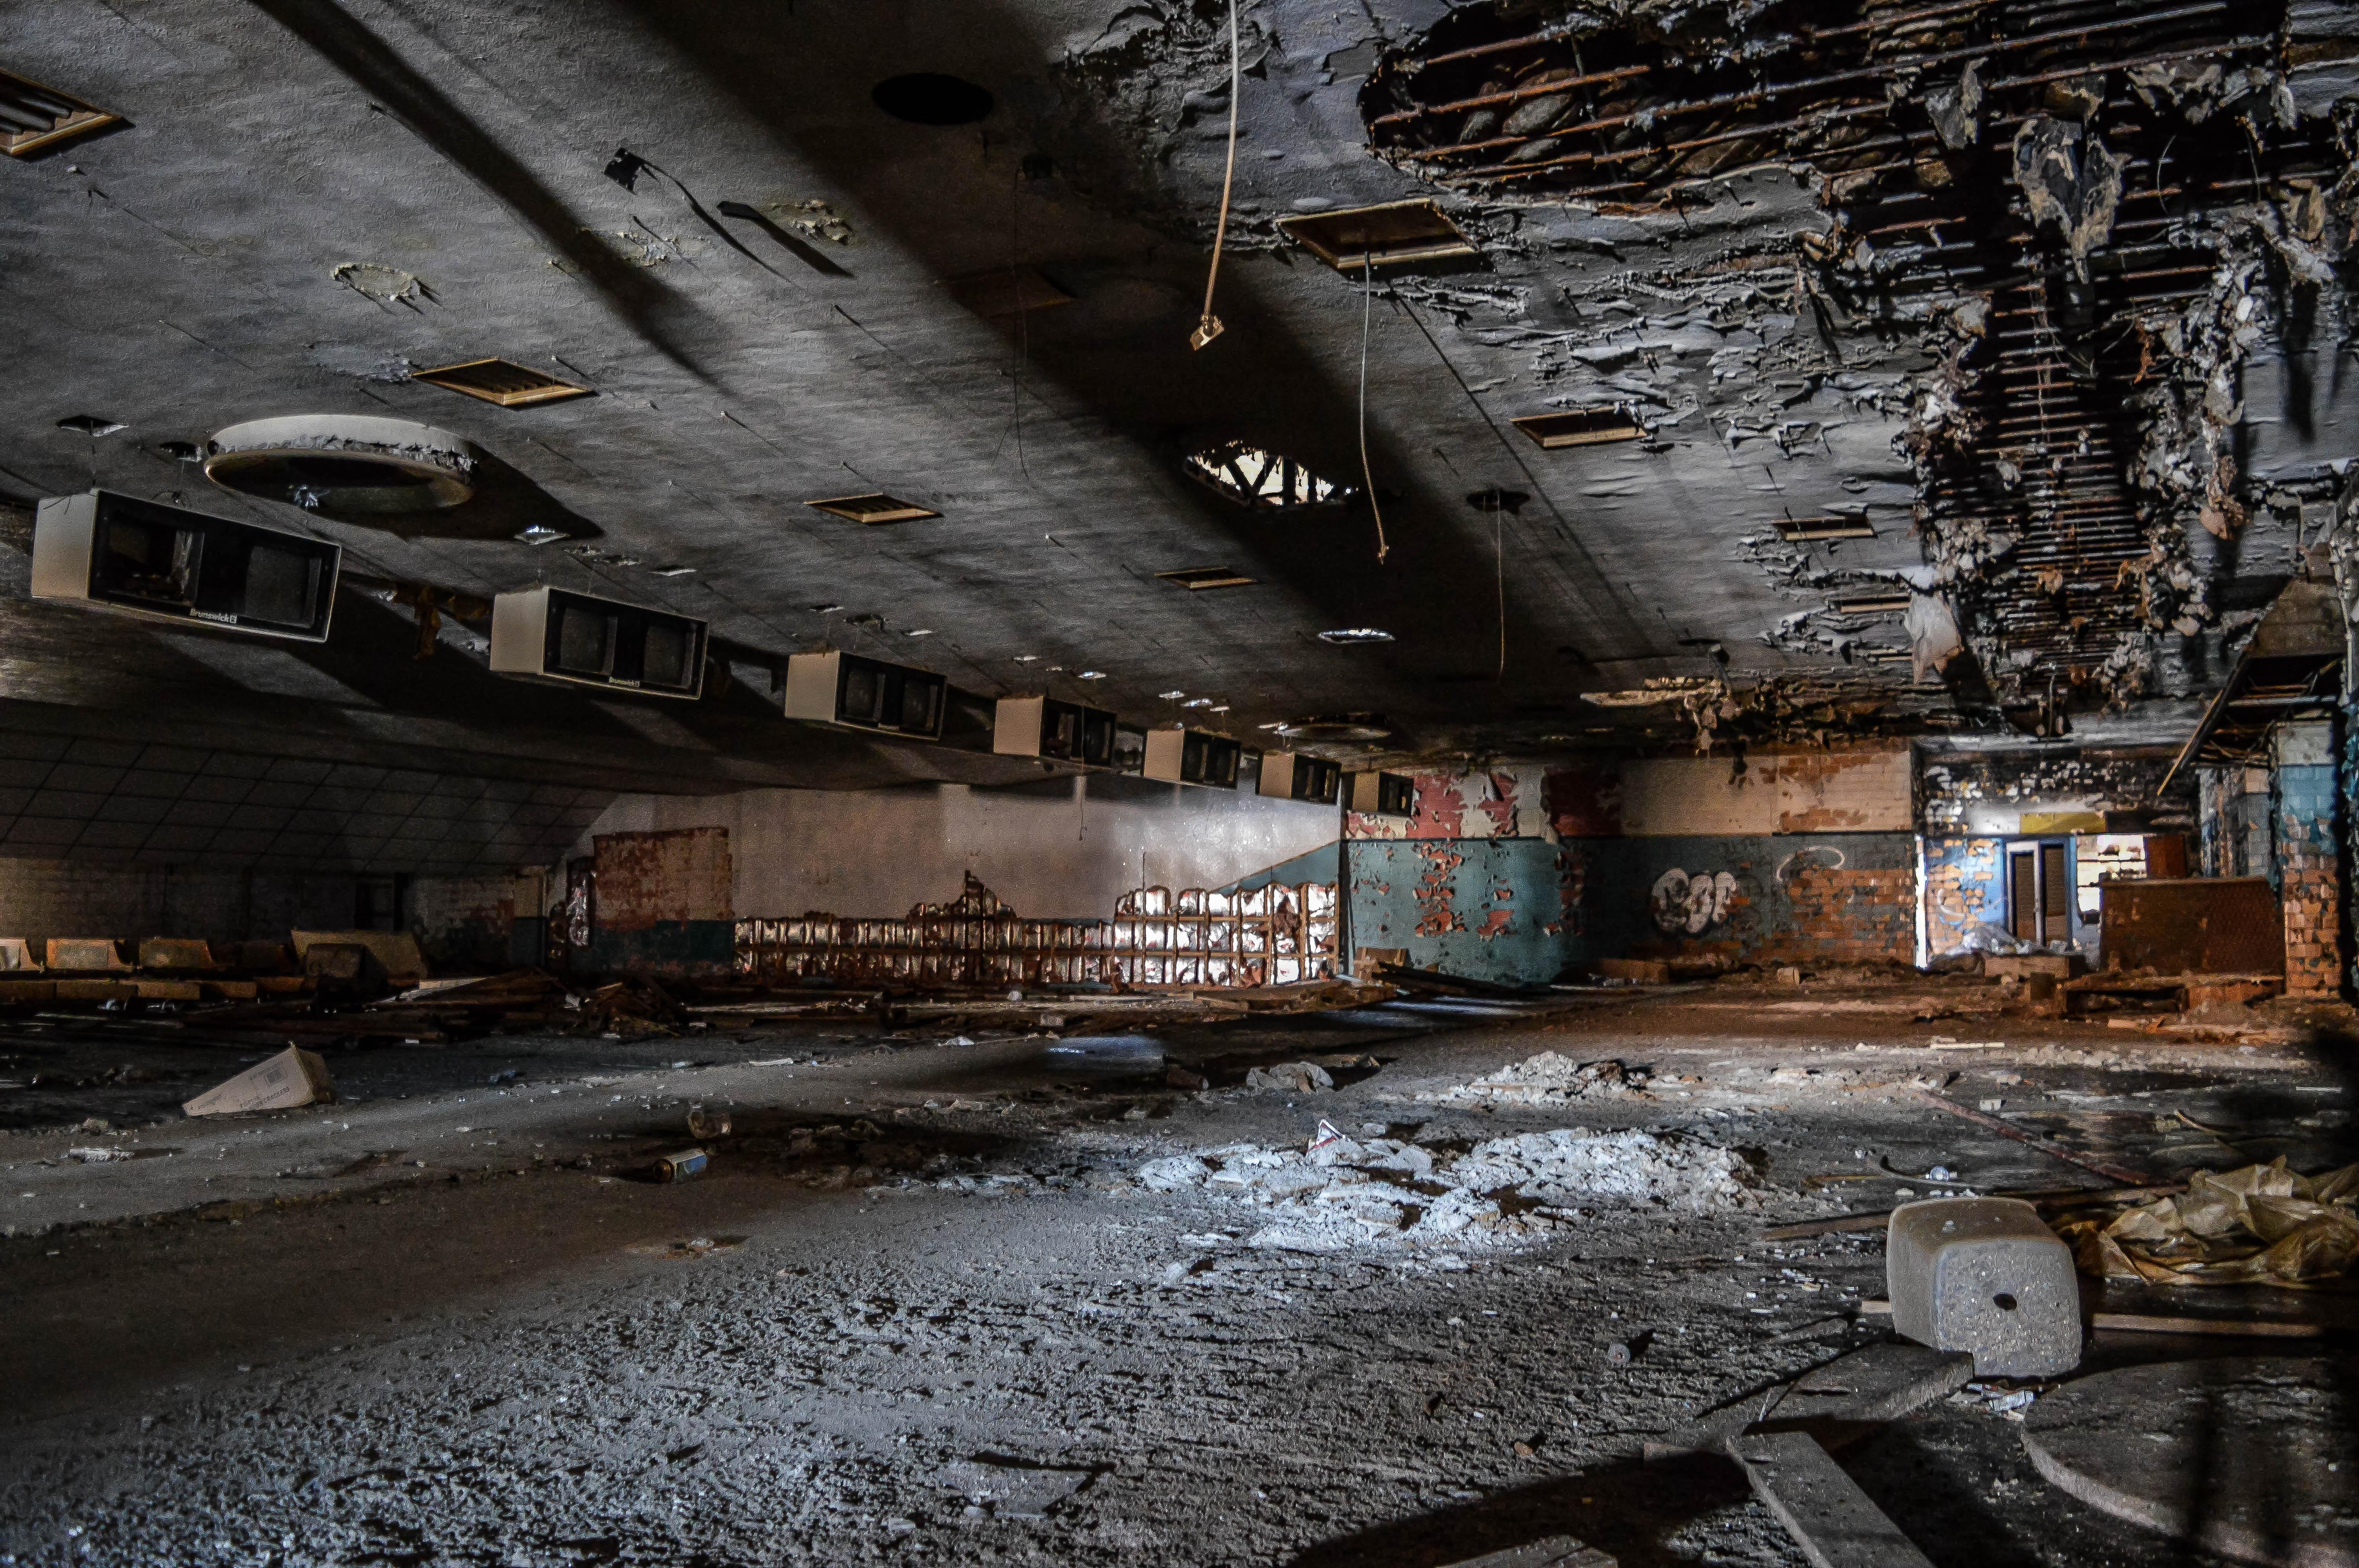 Abandoned Bowling Alley Flint Mi 6016 X 4000 Oc Abandoned Alley Flint